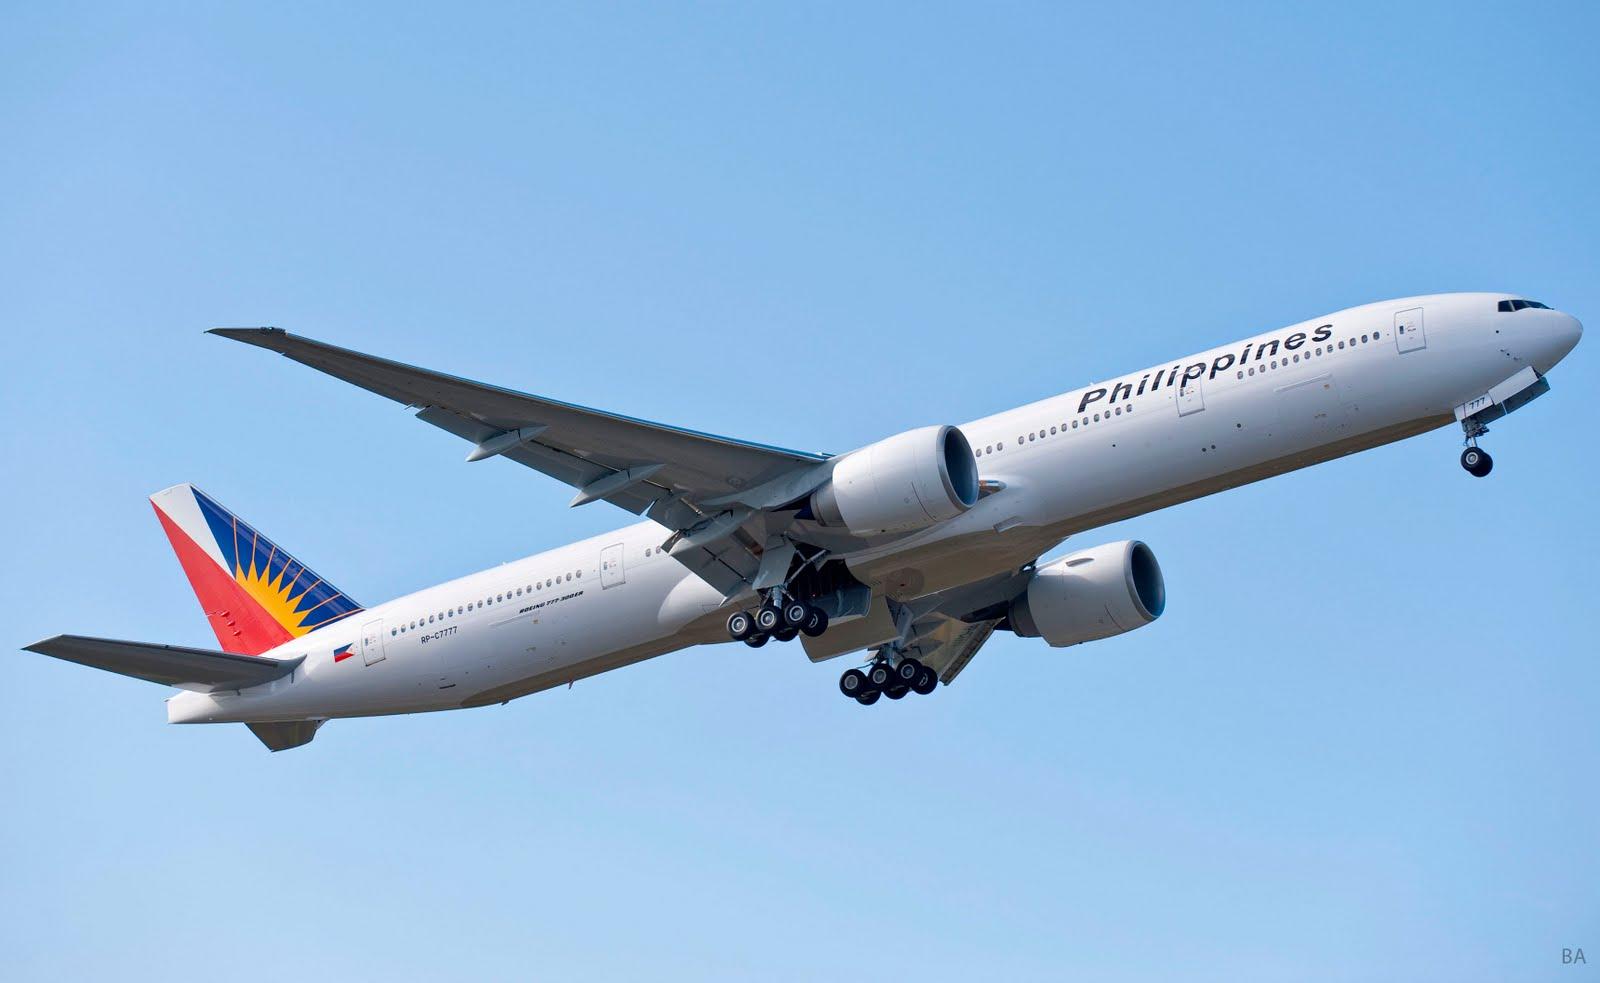 Phillipines_Airlines_first_Boeing_777-300ER_RP-C7777_K64800-03.jpg